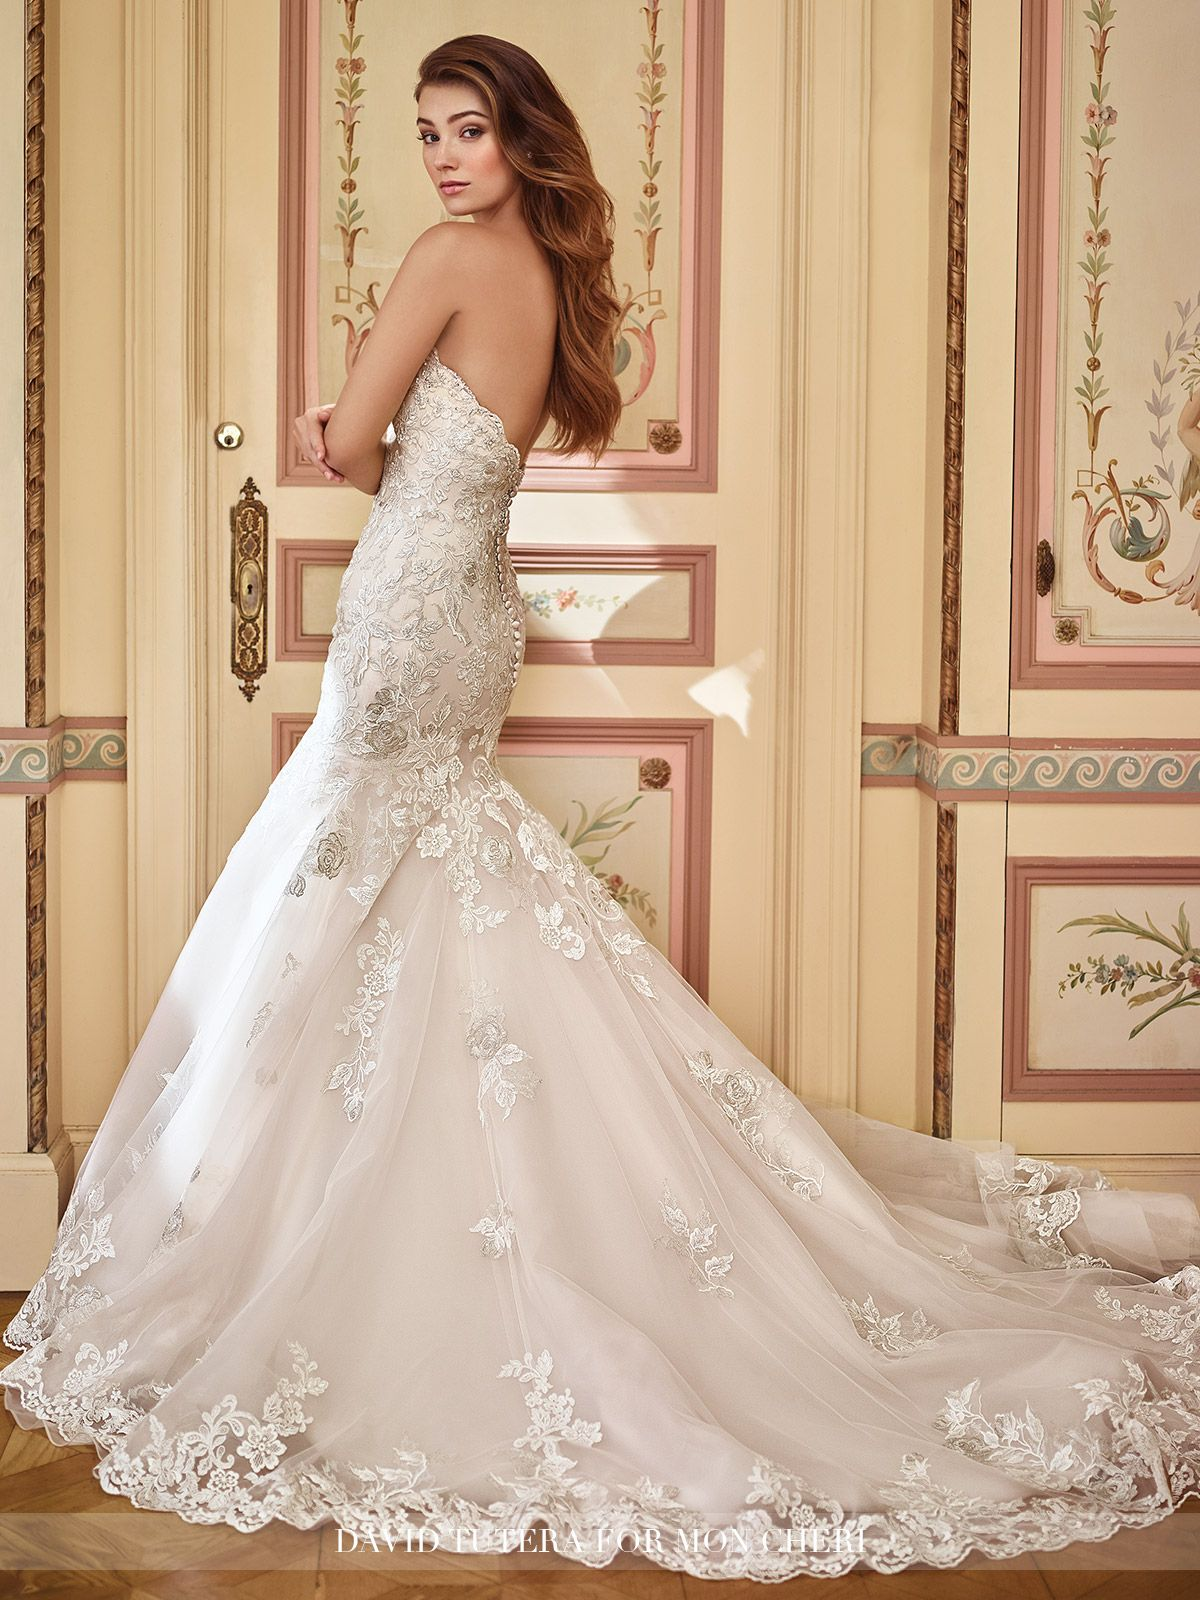 Pin On Weddings Wedding Dresses